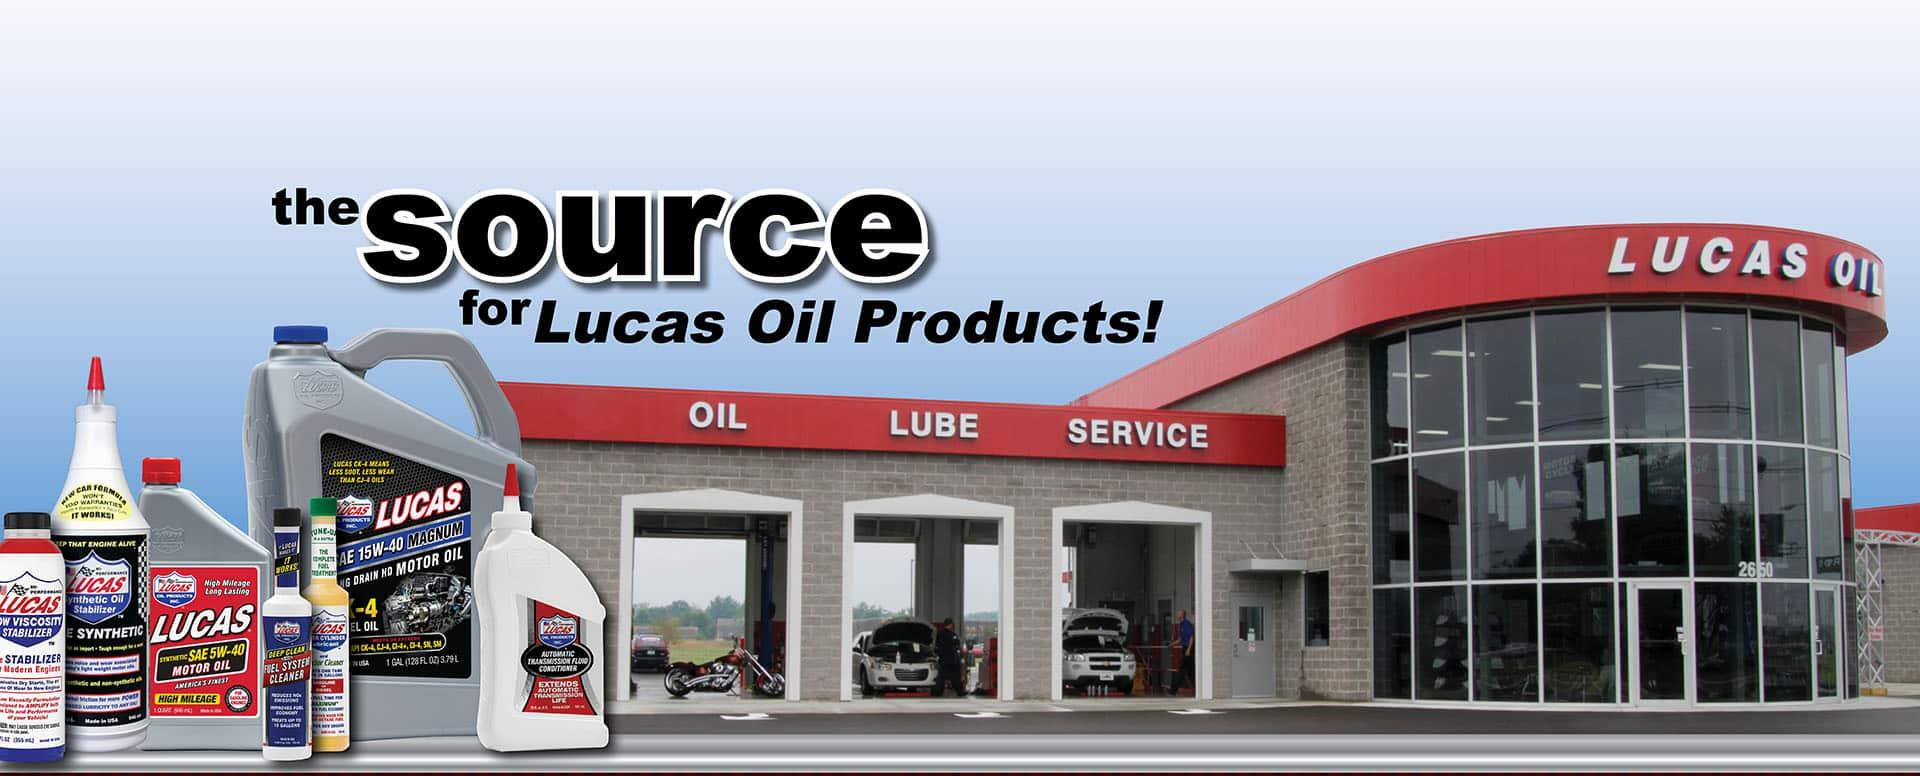 Get deal alerts for Lucas Oil Center